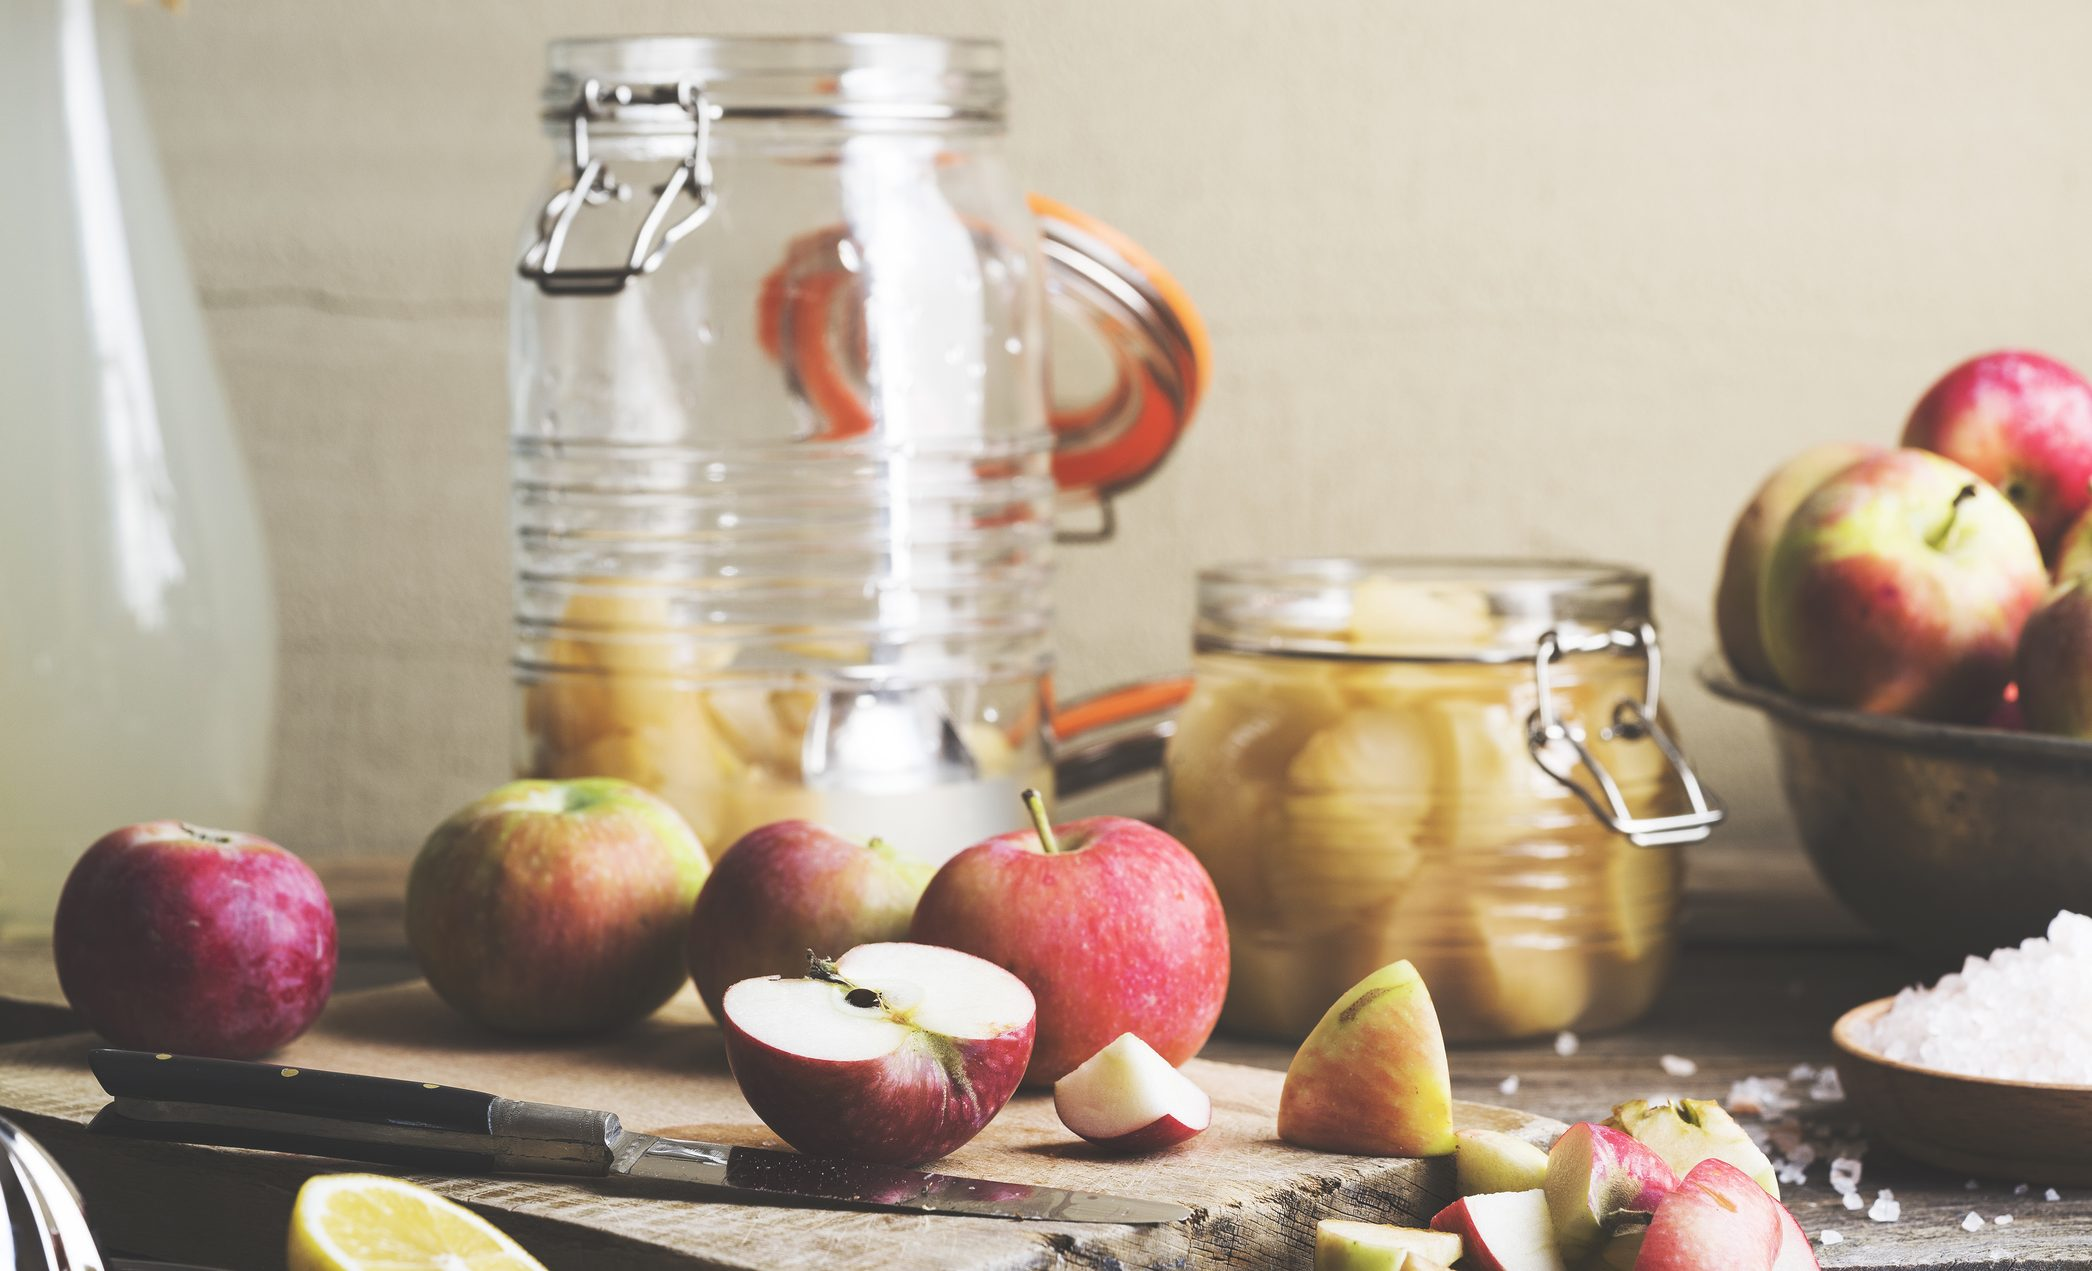 is apple cider vinegar harming your teeth?